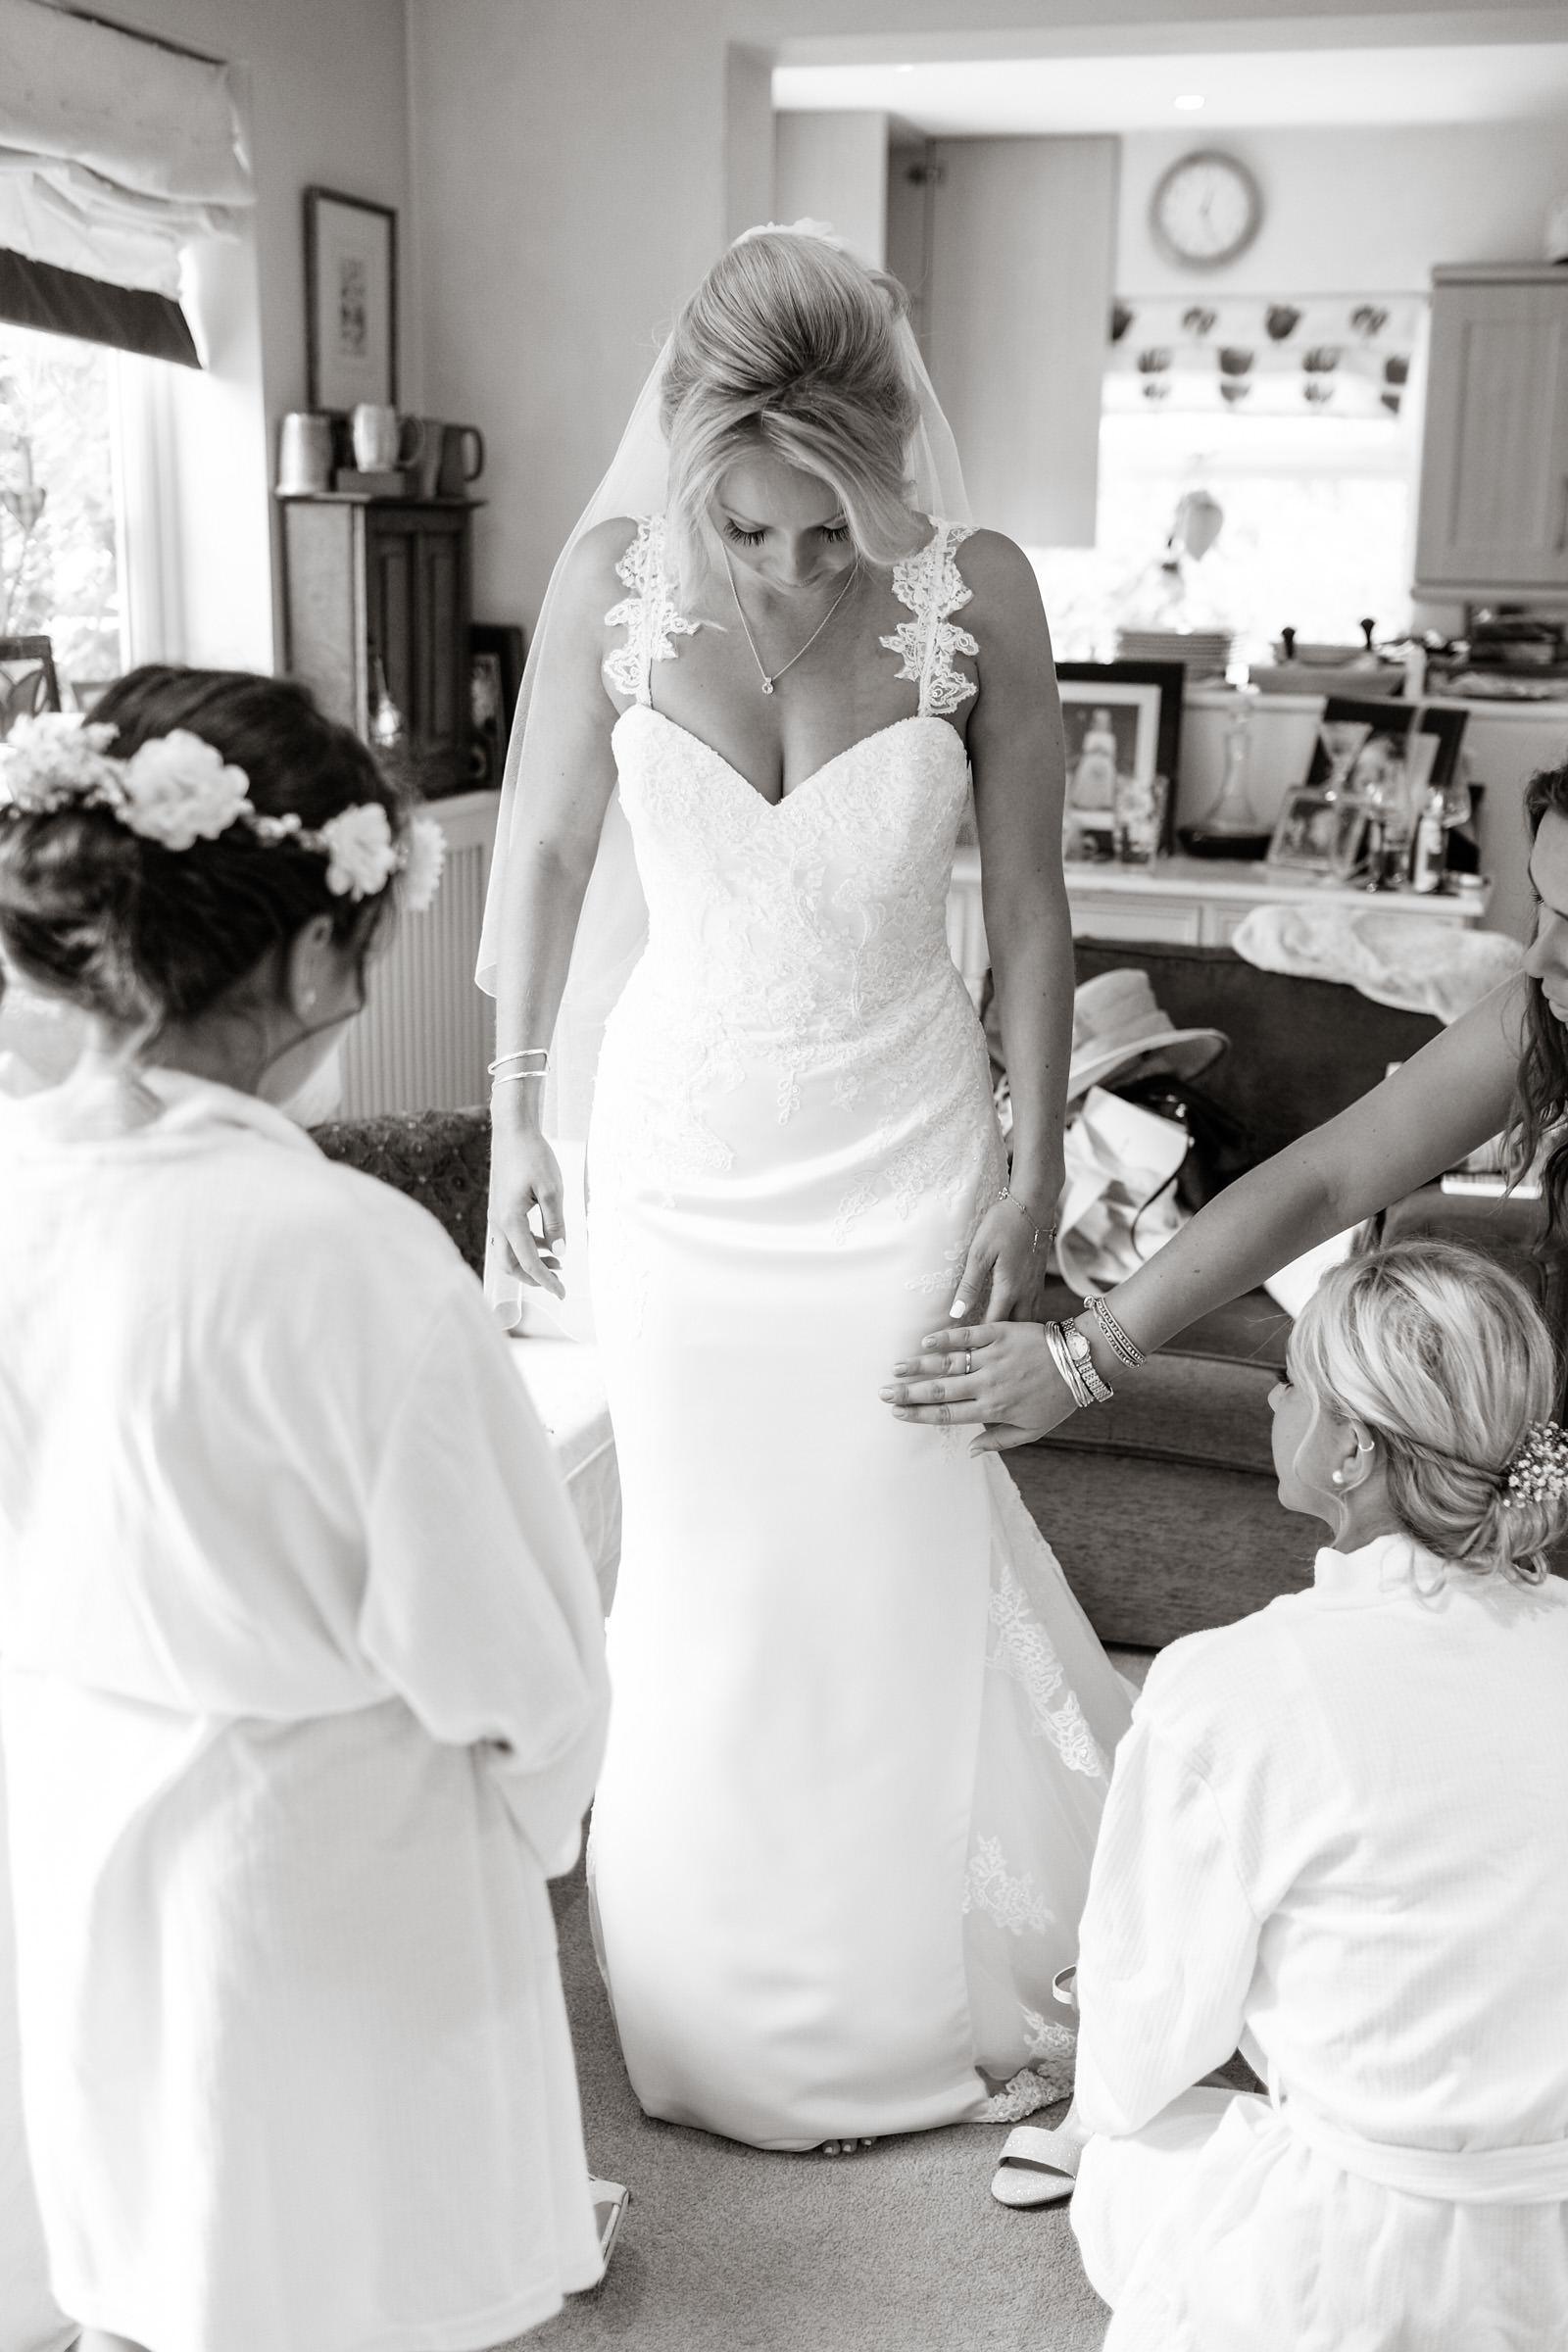 Wedding at Parkside School in Surrey 007.jpg